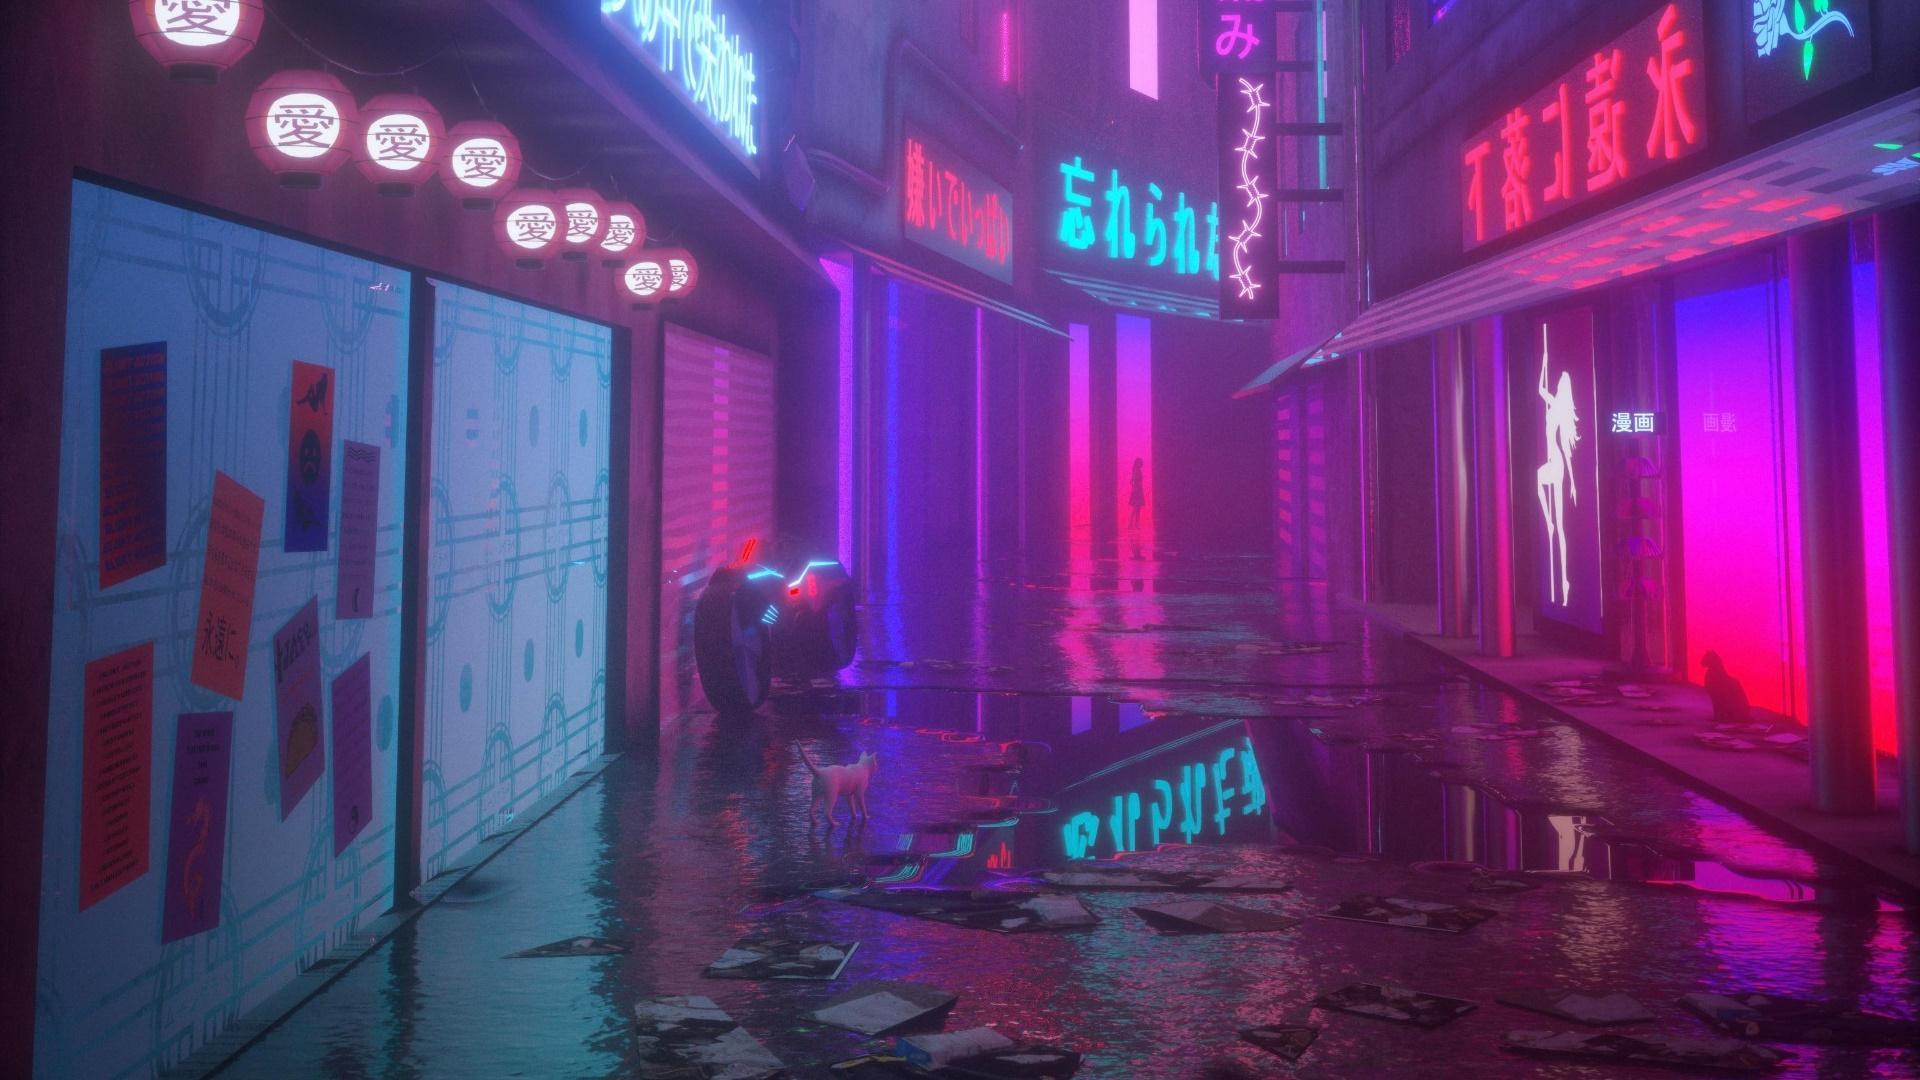 Cyberpunk game city wallpaper